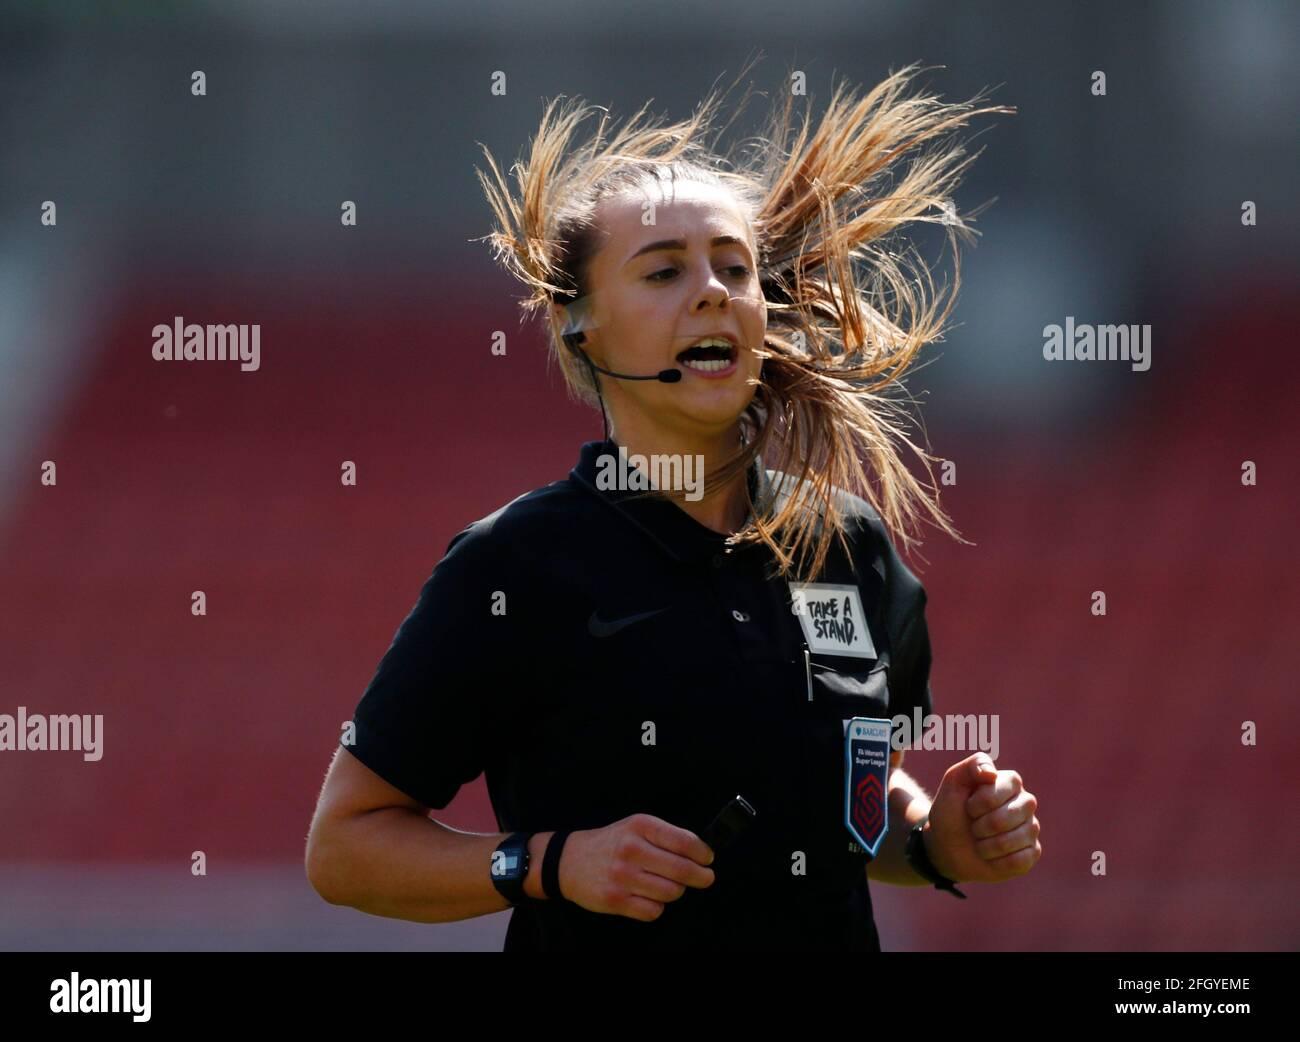 Fútbol Fútbol - Super Liga Femenina - Manchester United v Tottenham Hotspur - Leigh Sports Village, Manchester, Gran Bretaña - 25 de abril de 2021 Referee Cristiana Hattersley Action Images via Reuters/Lee Smith Foto de stock